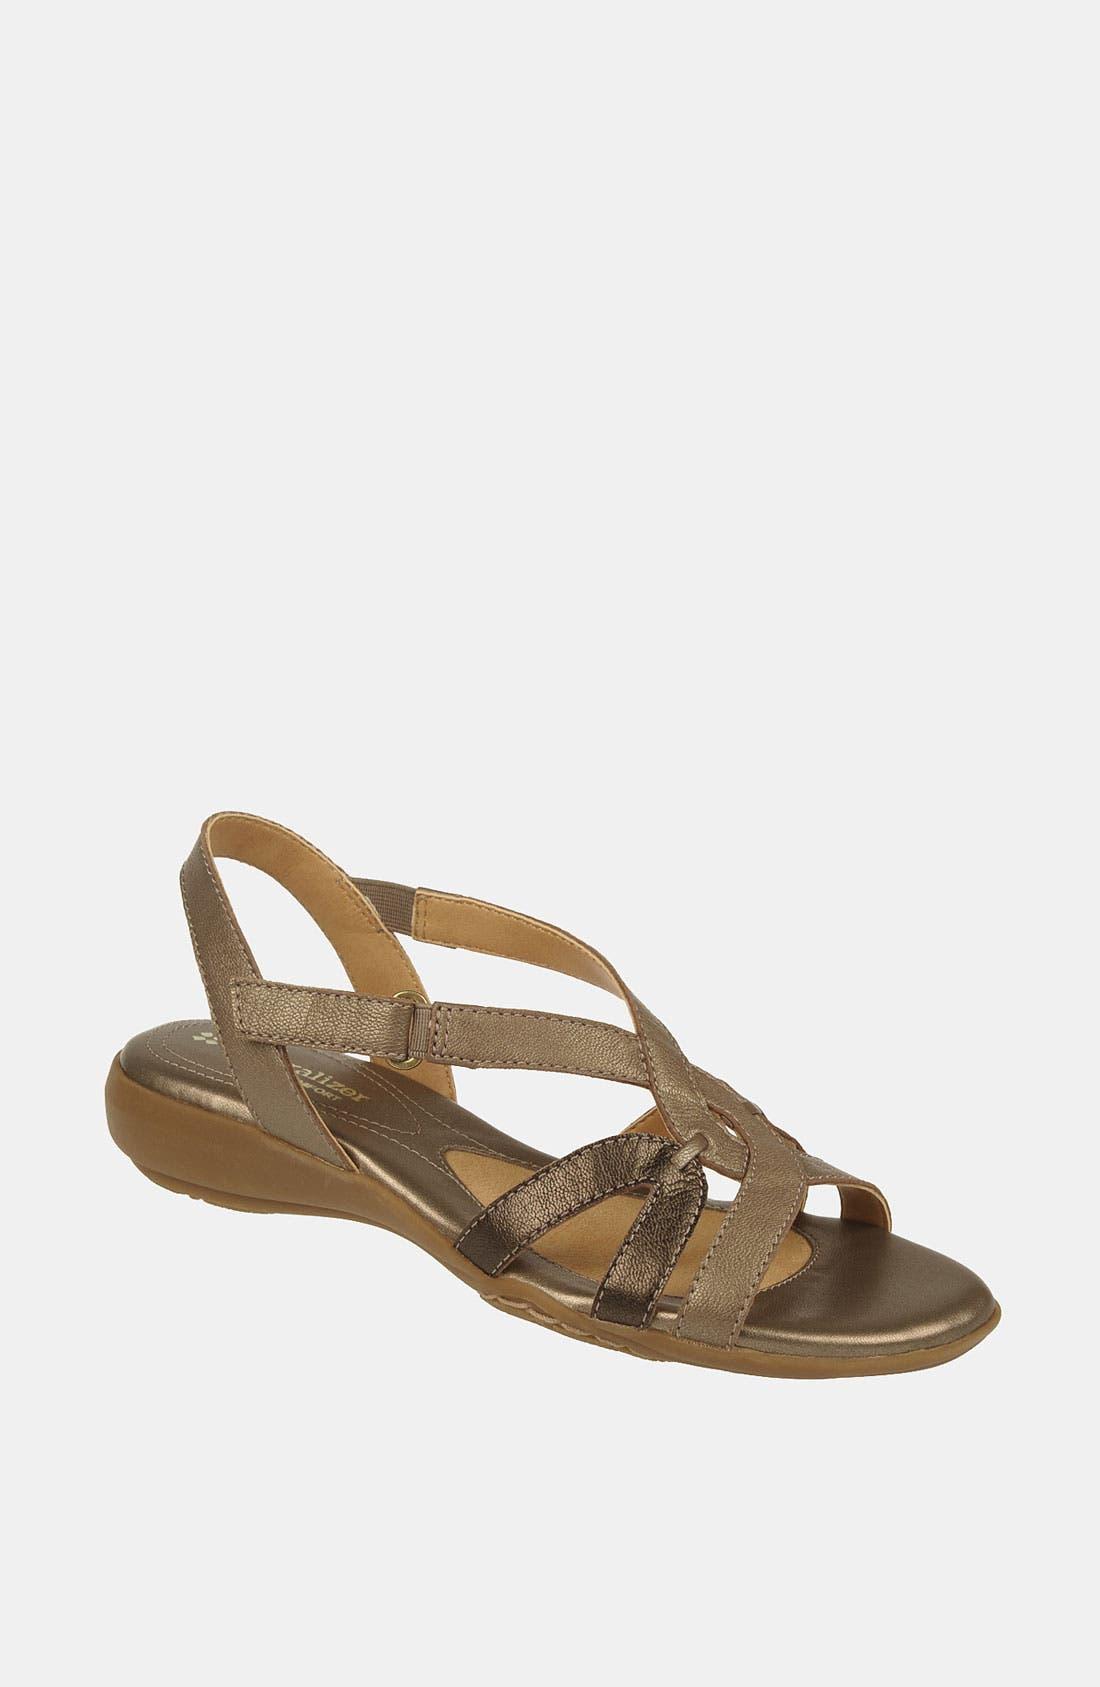 Alternate Image 1 Selected - Naturalizer 'Cooper' Sandal